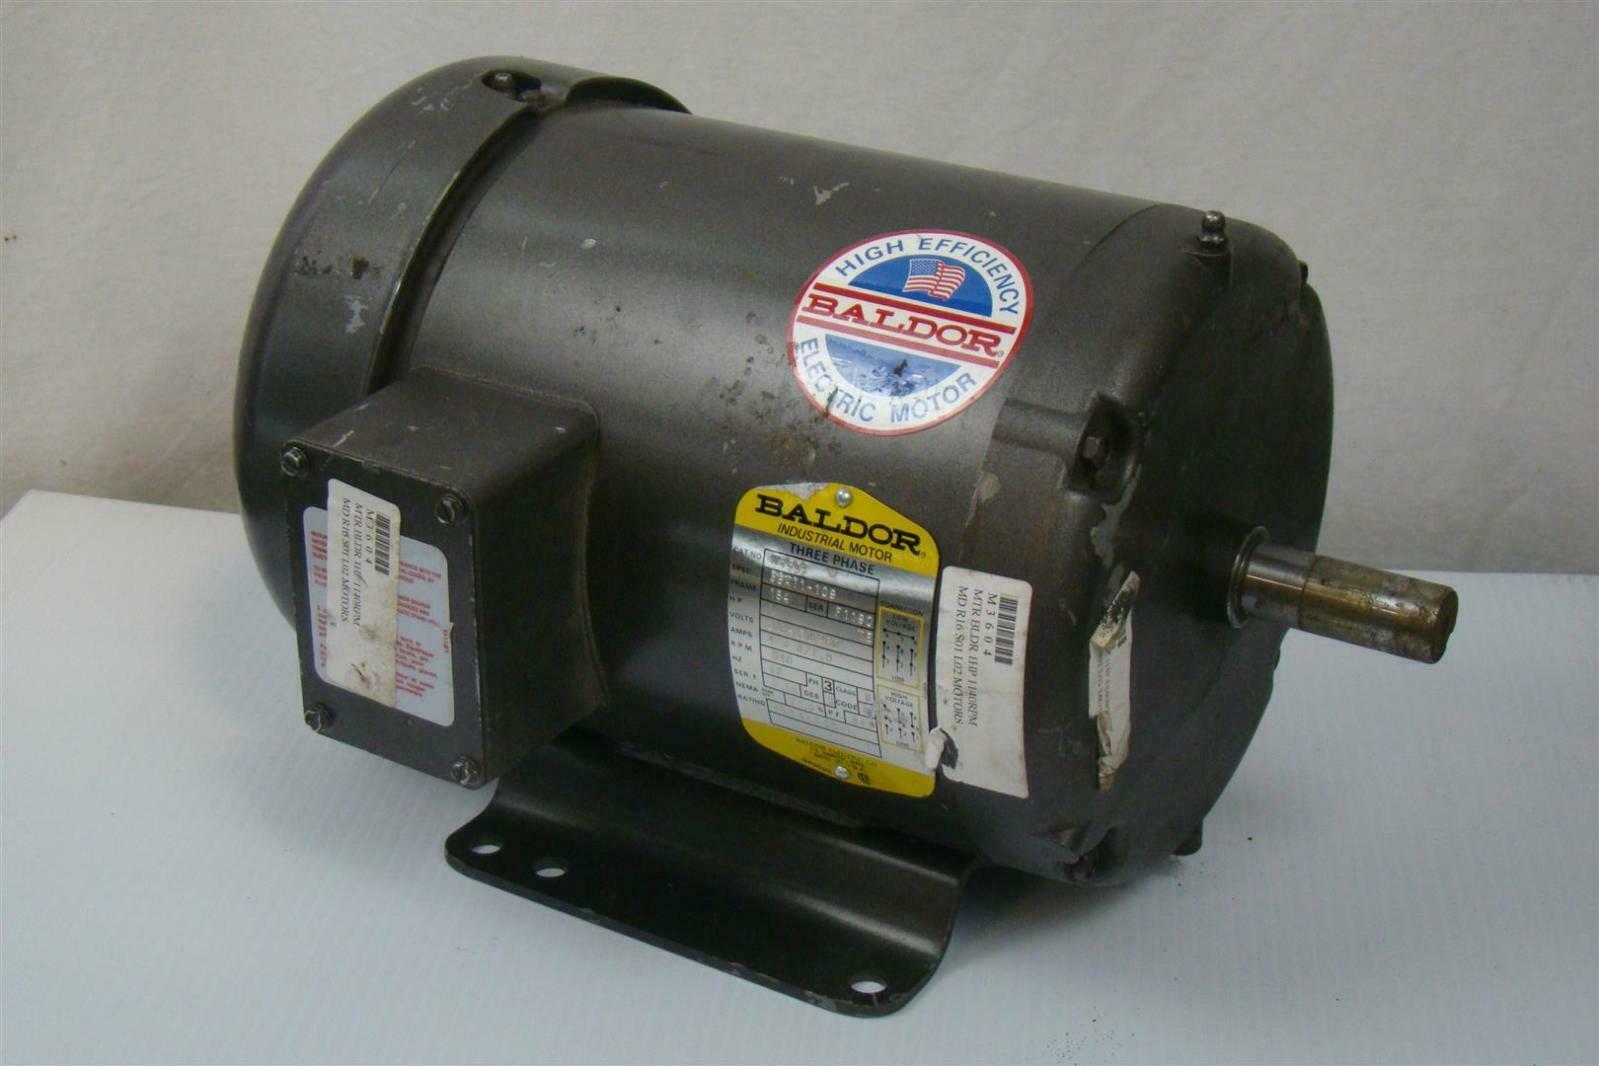 Baldor industrial motor 1 hp 208 460v 1140rpm m3604 Baldor industrial motor pump